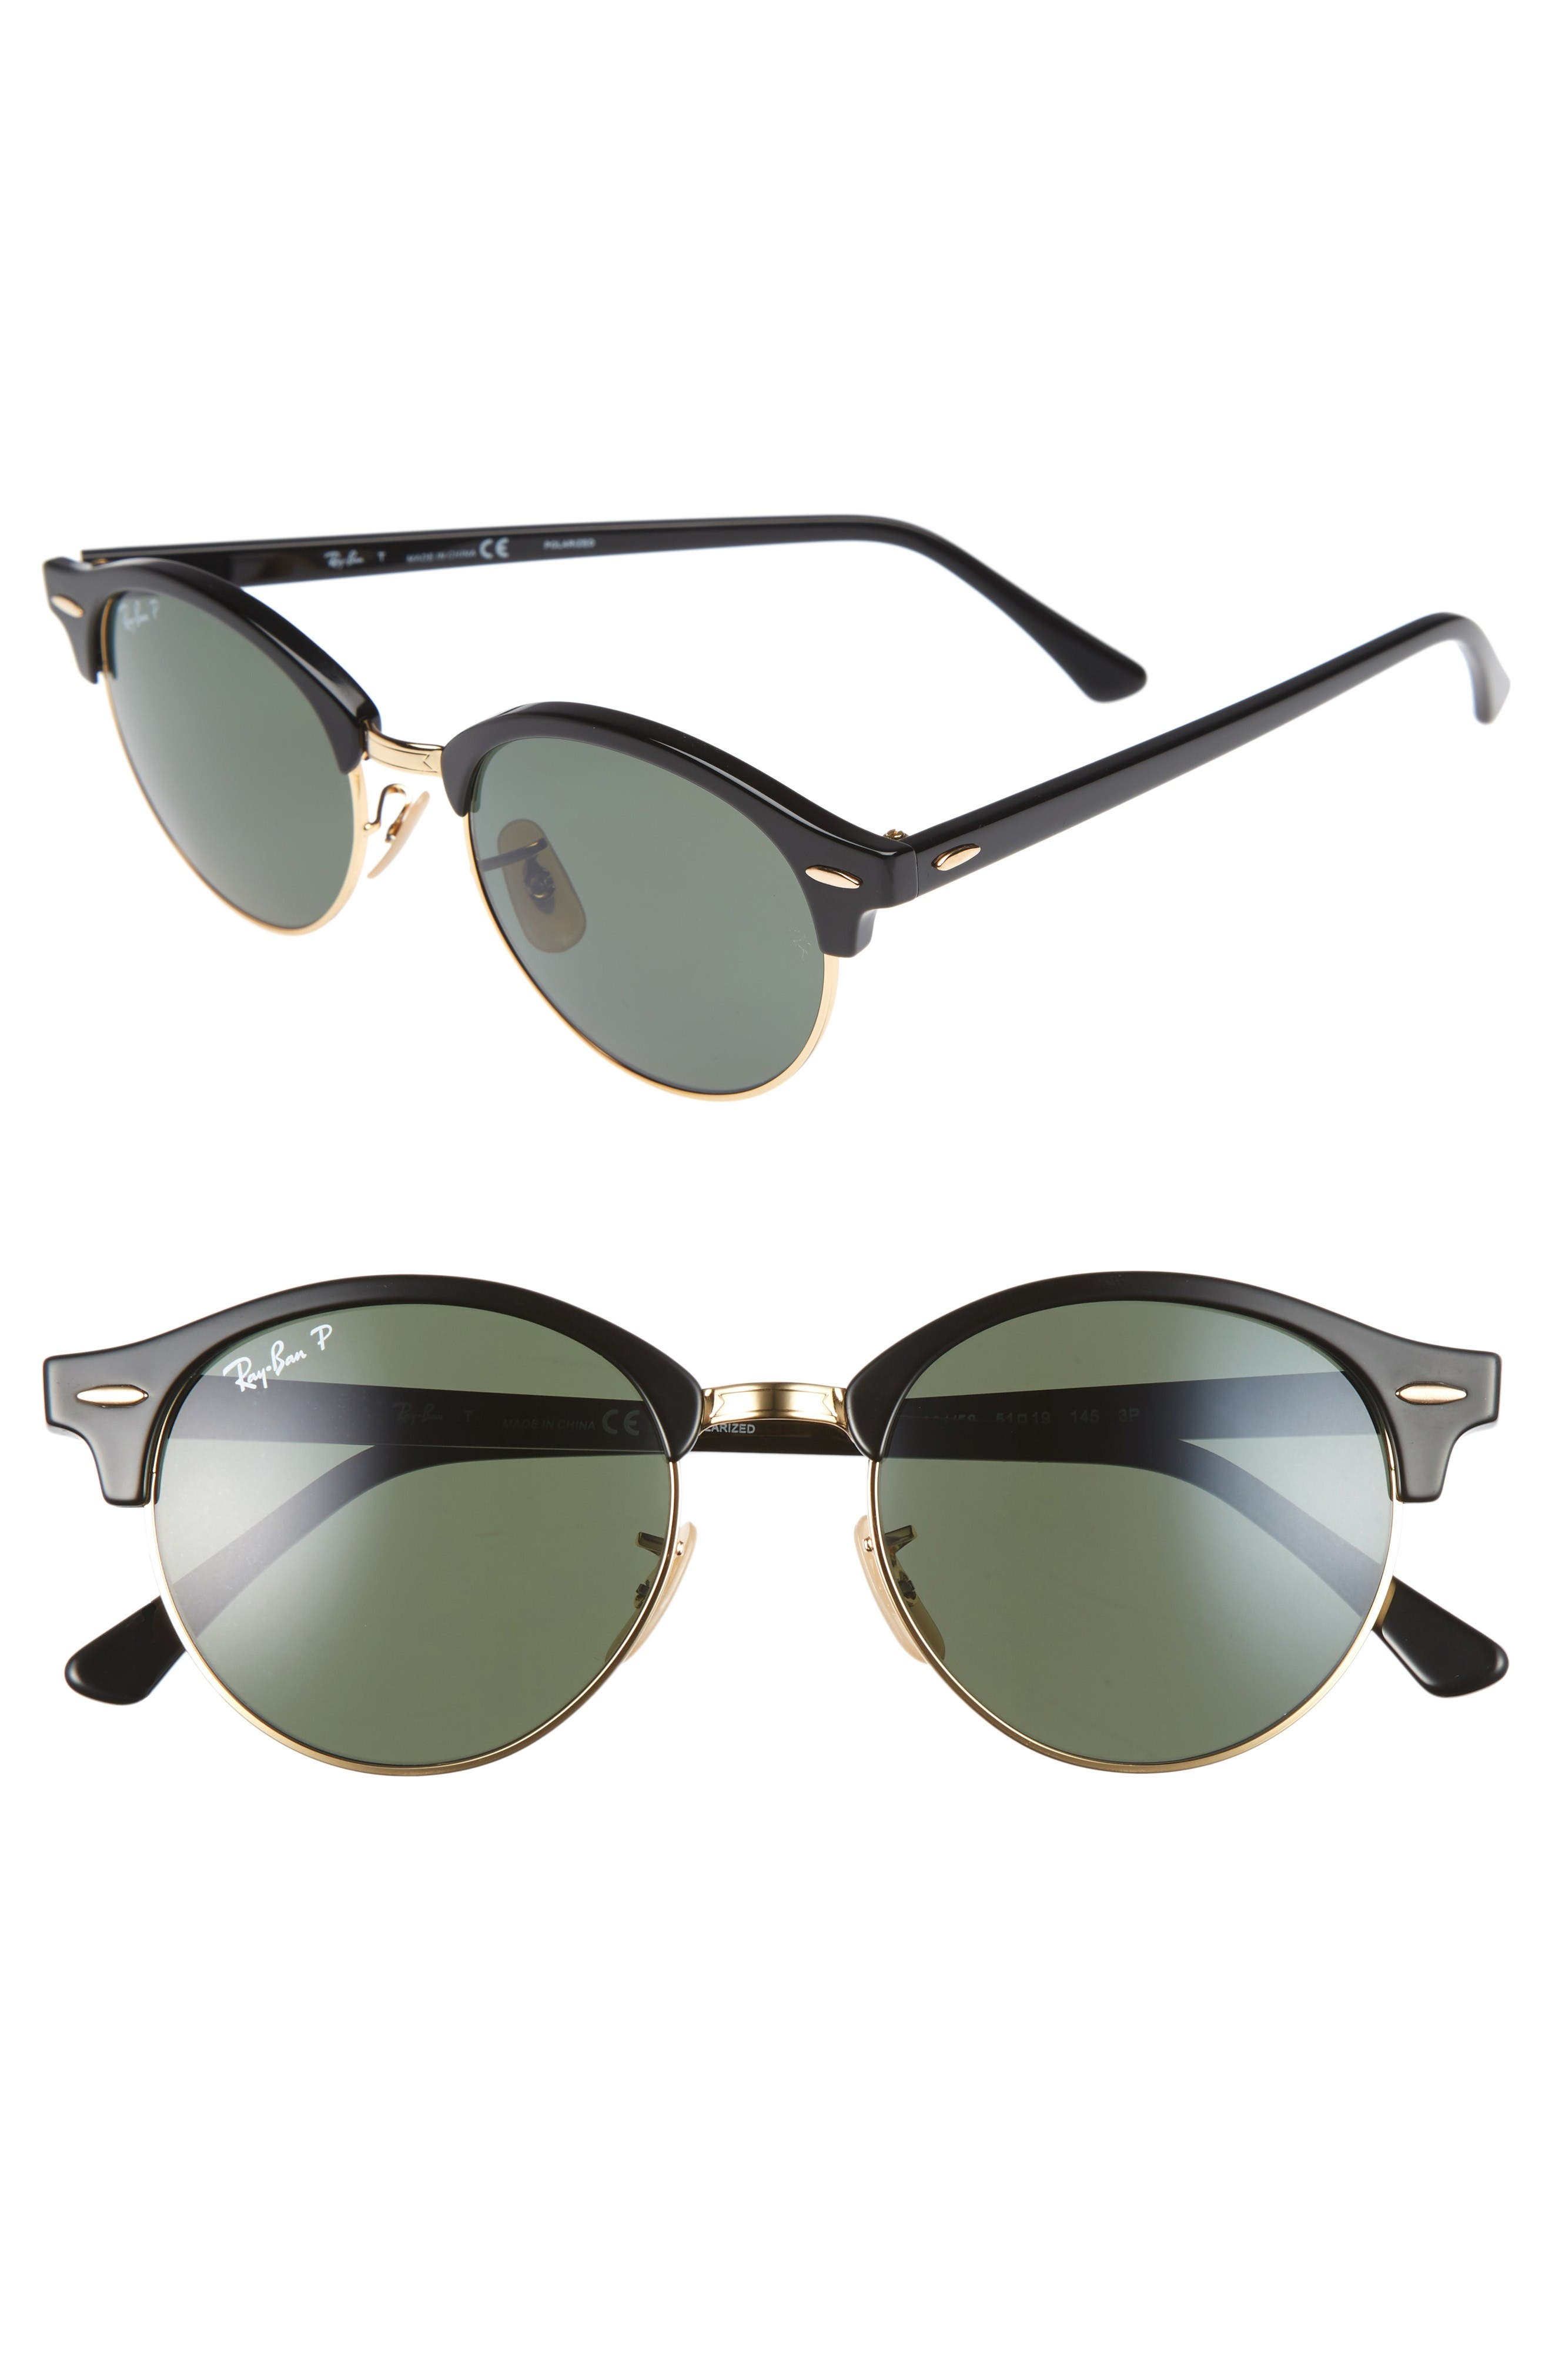 Ray-Ban Clubround 51mm Polarized Sunglasses